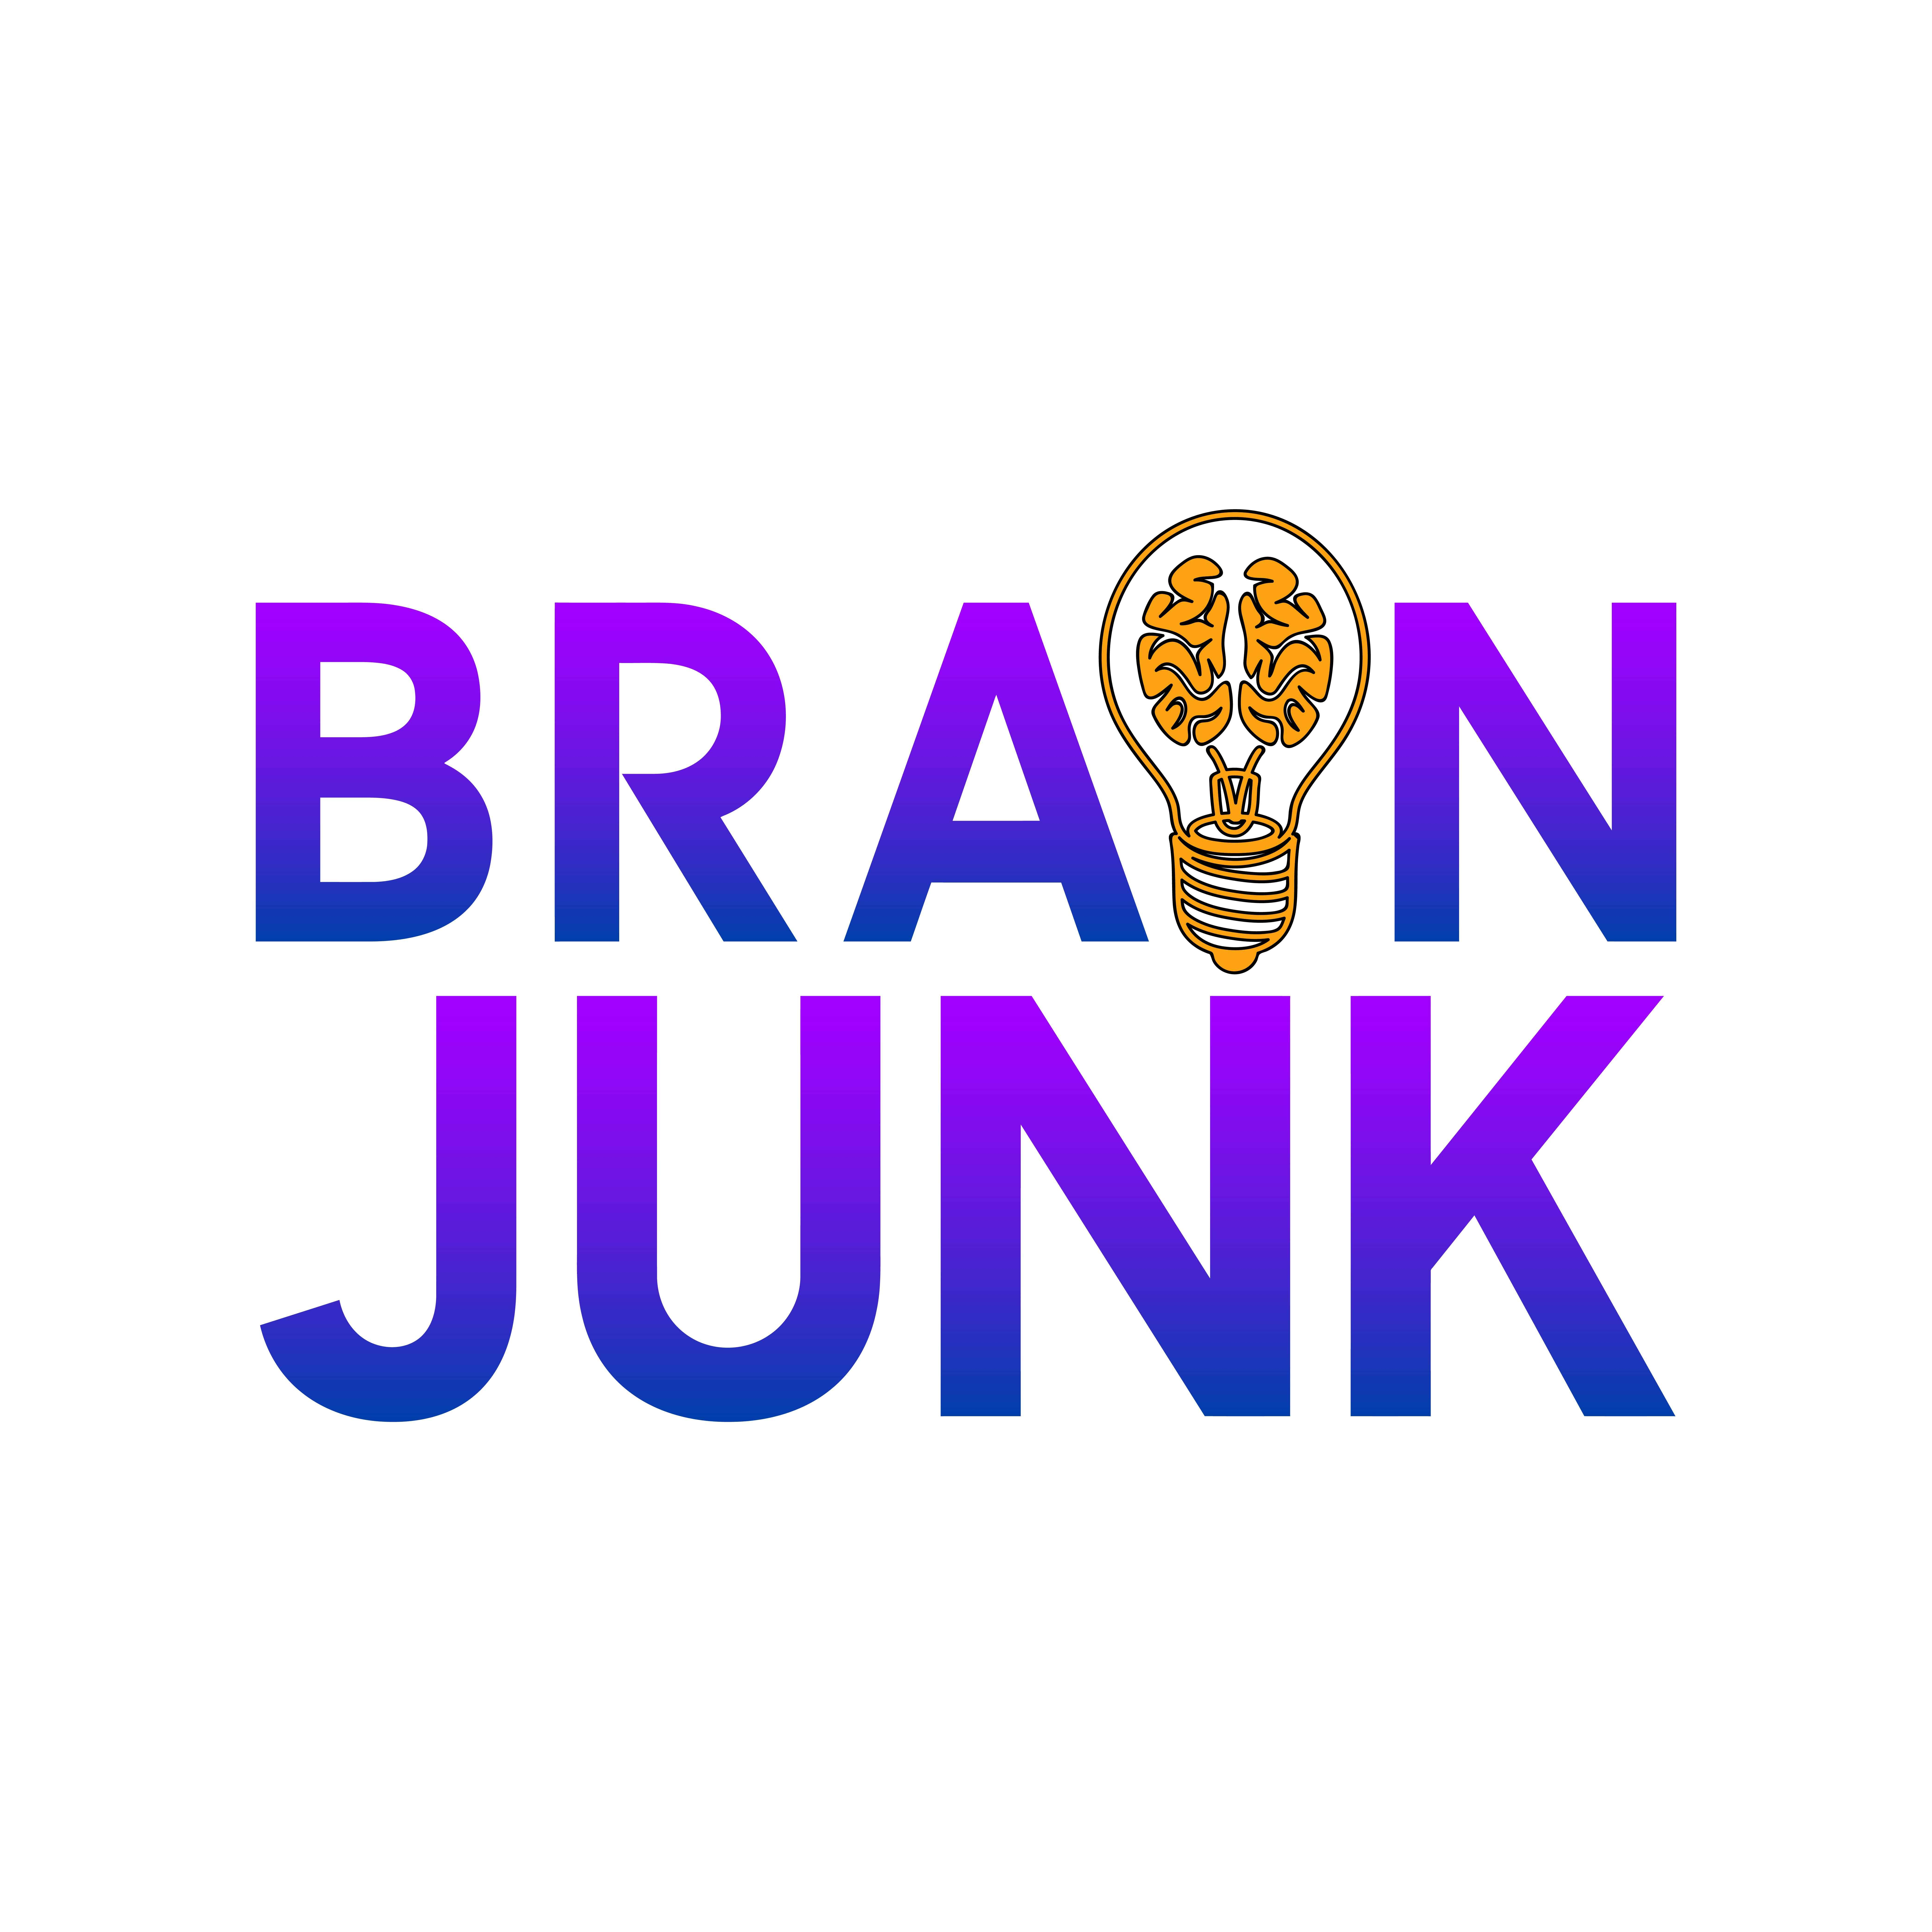 Brain_junk_words_orange_lightbulb_logo_small